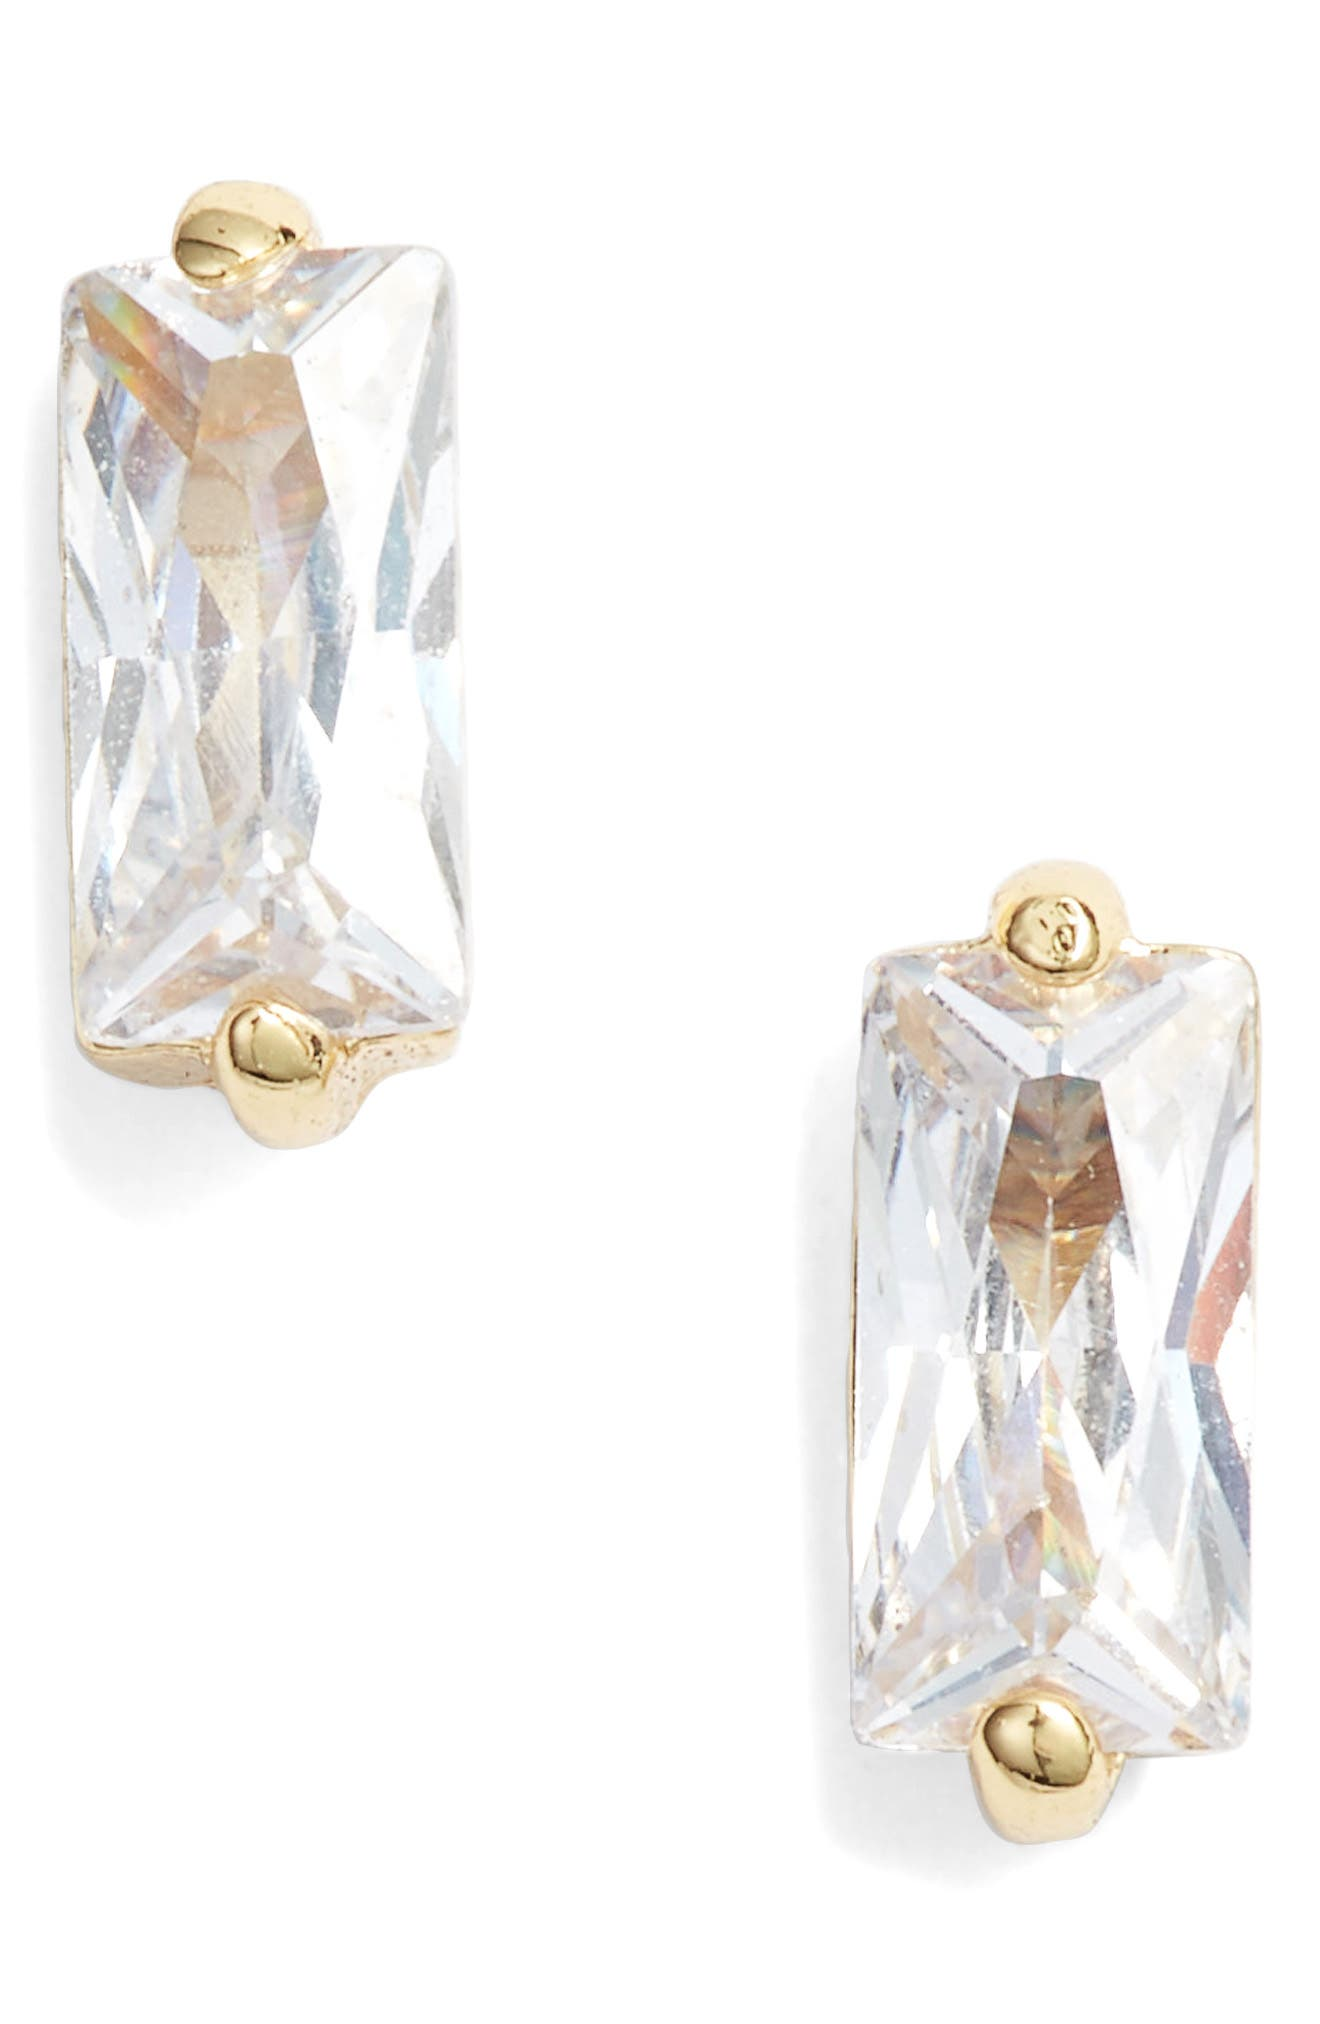 GORJANA, Amara Stud Earrings, Main thumbnail 1, color, GOLD